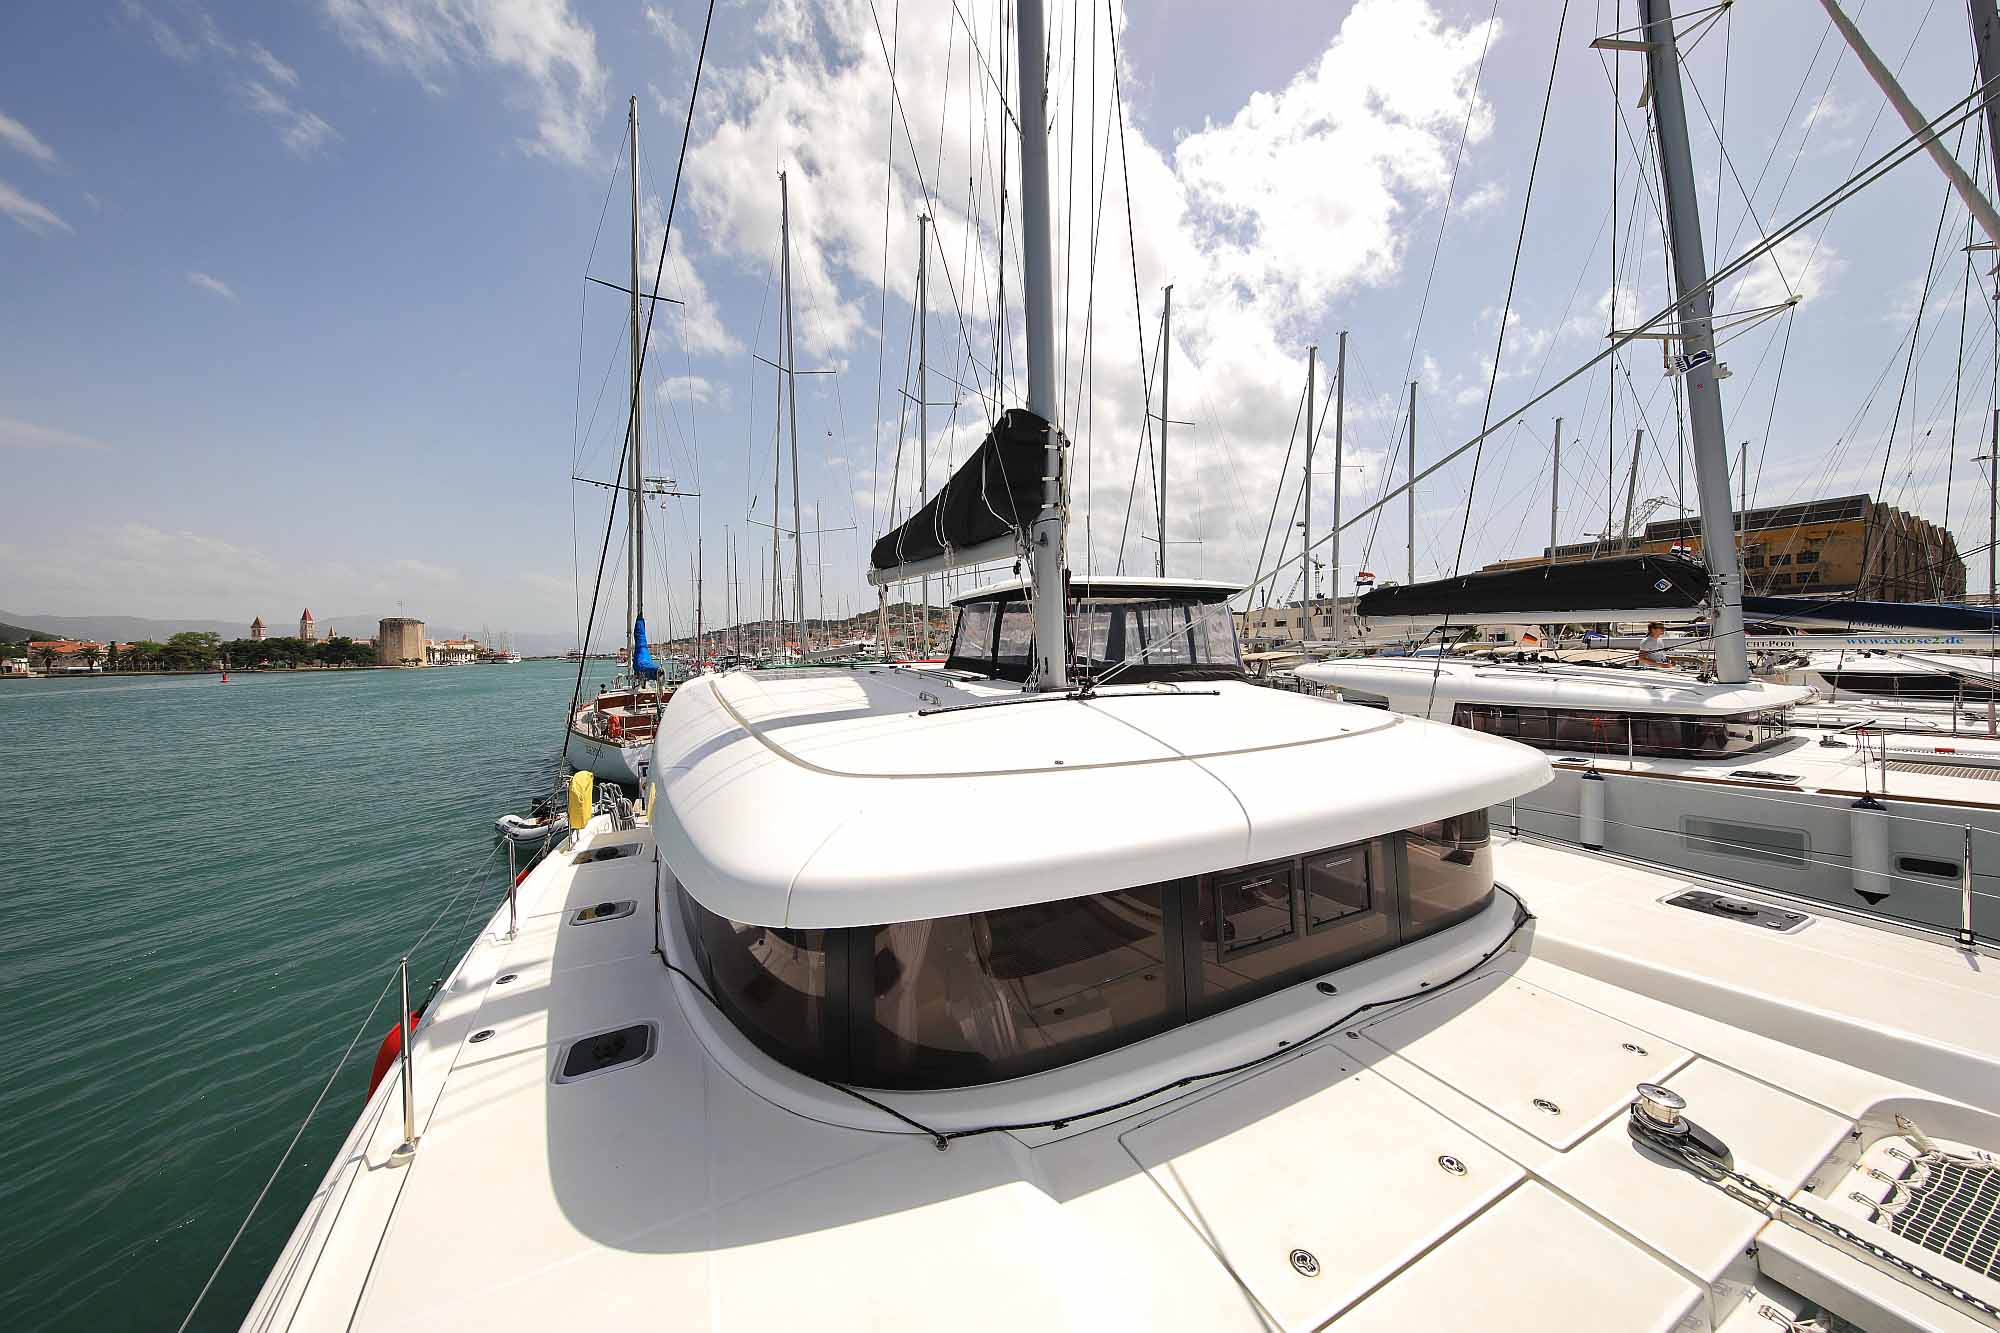 Vordeck Katamaran Lagoon 42: Bereit für Katamarantraining, Skippertraining, Hafenmanöver Training